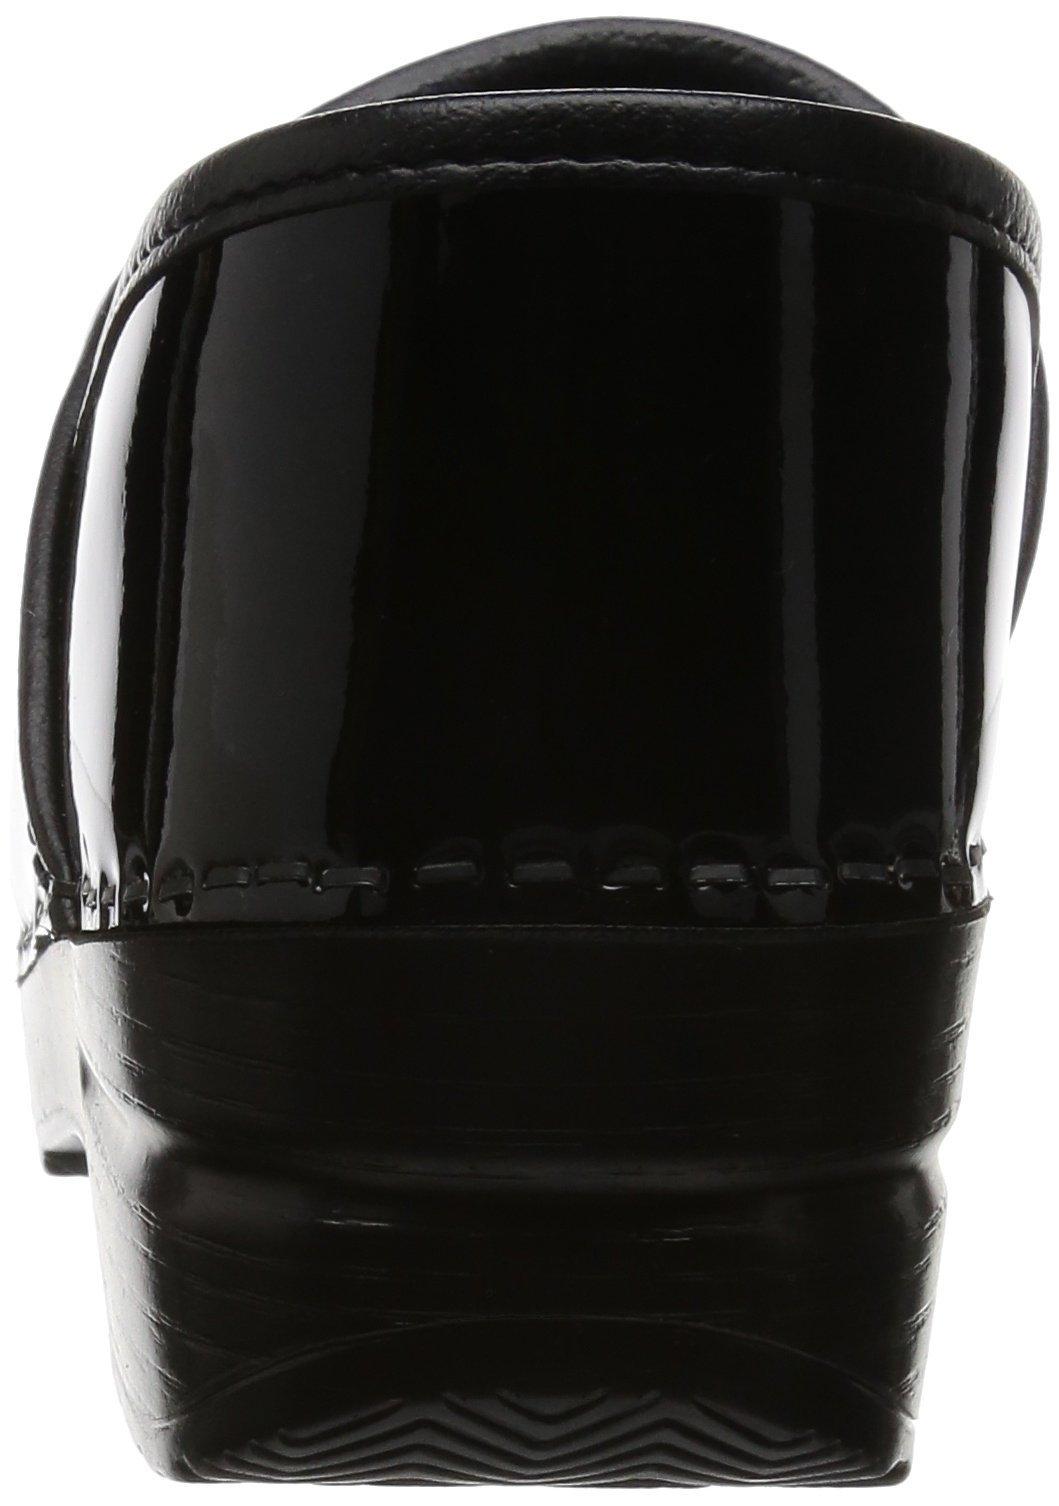 Dansko Women's Professional Patent Leather Clog,Black Patent,37 EU / 6.5-7 B(M) US by Dansko (Image #2)